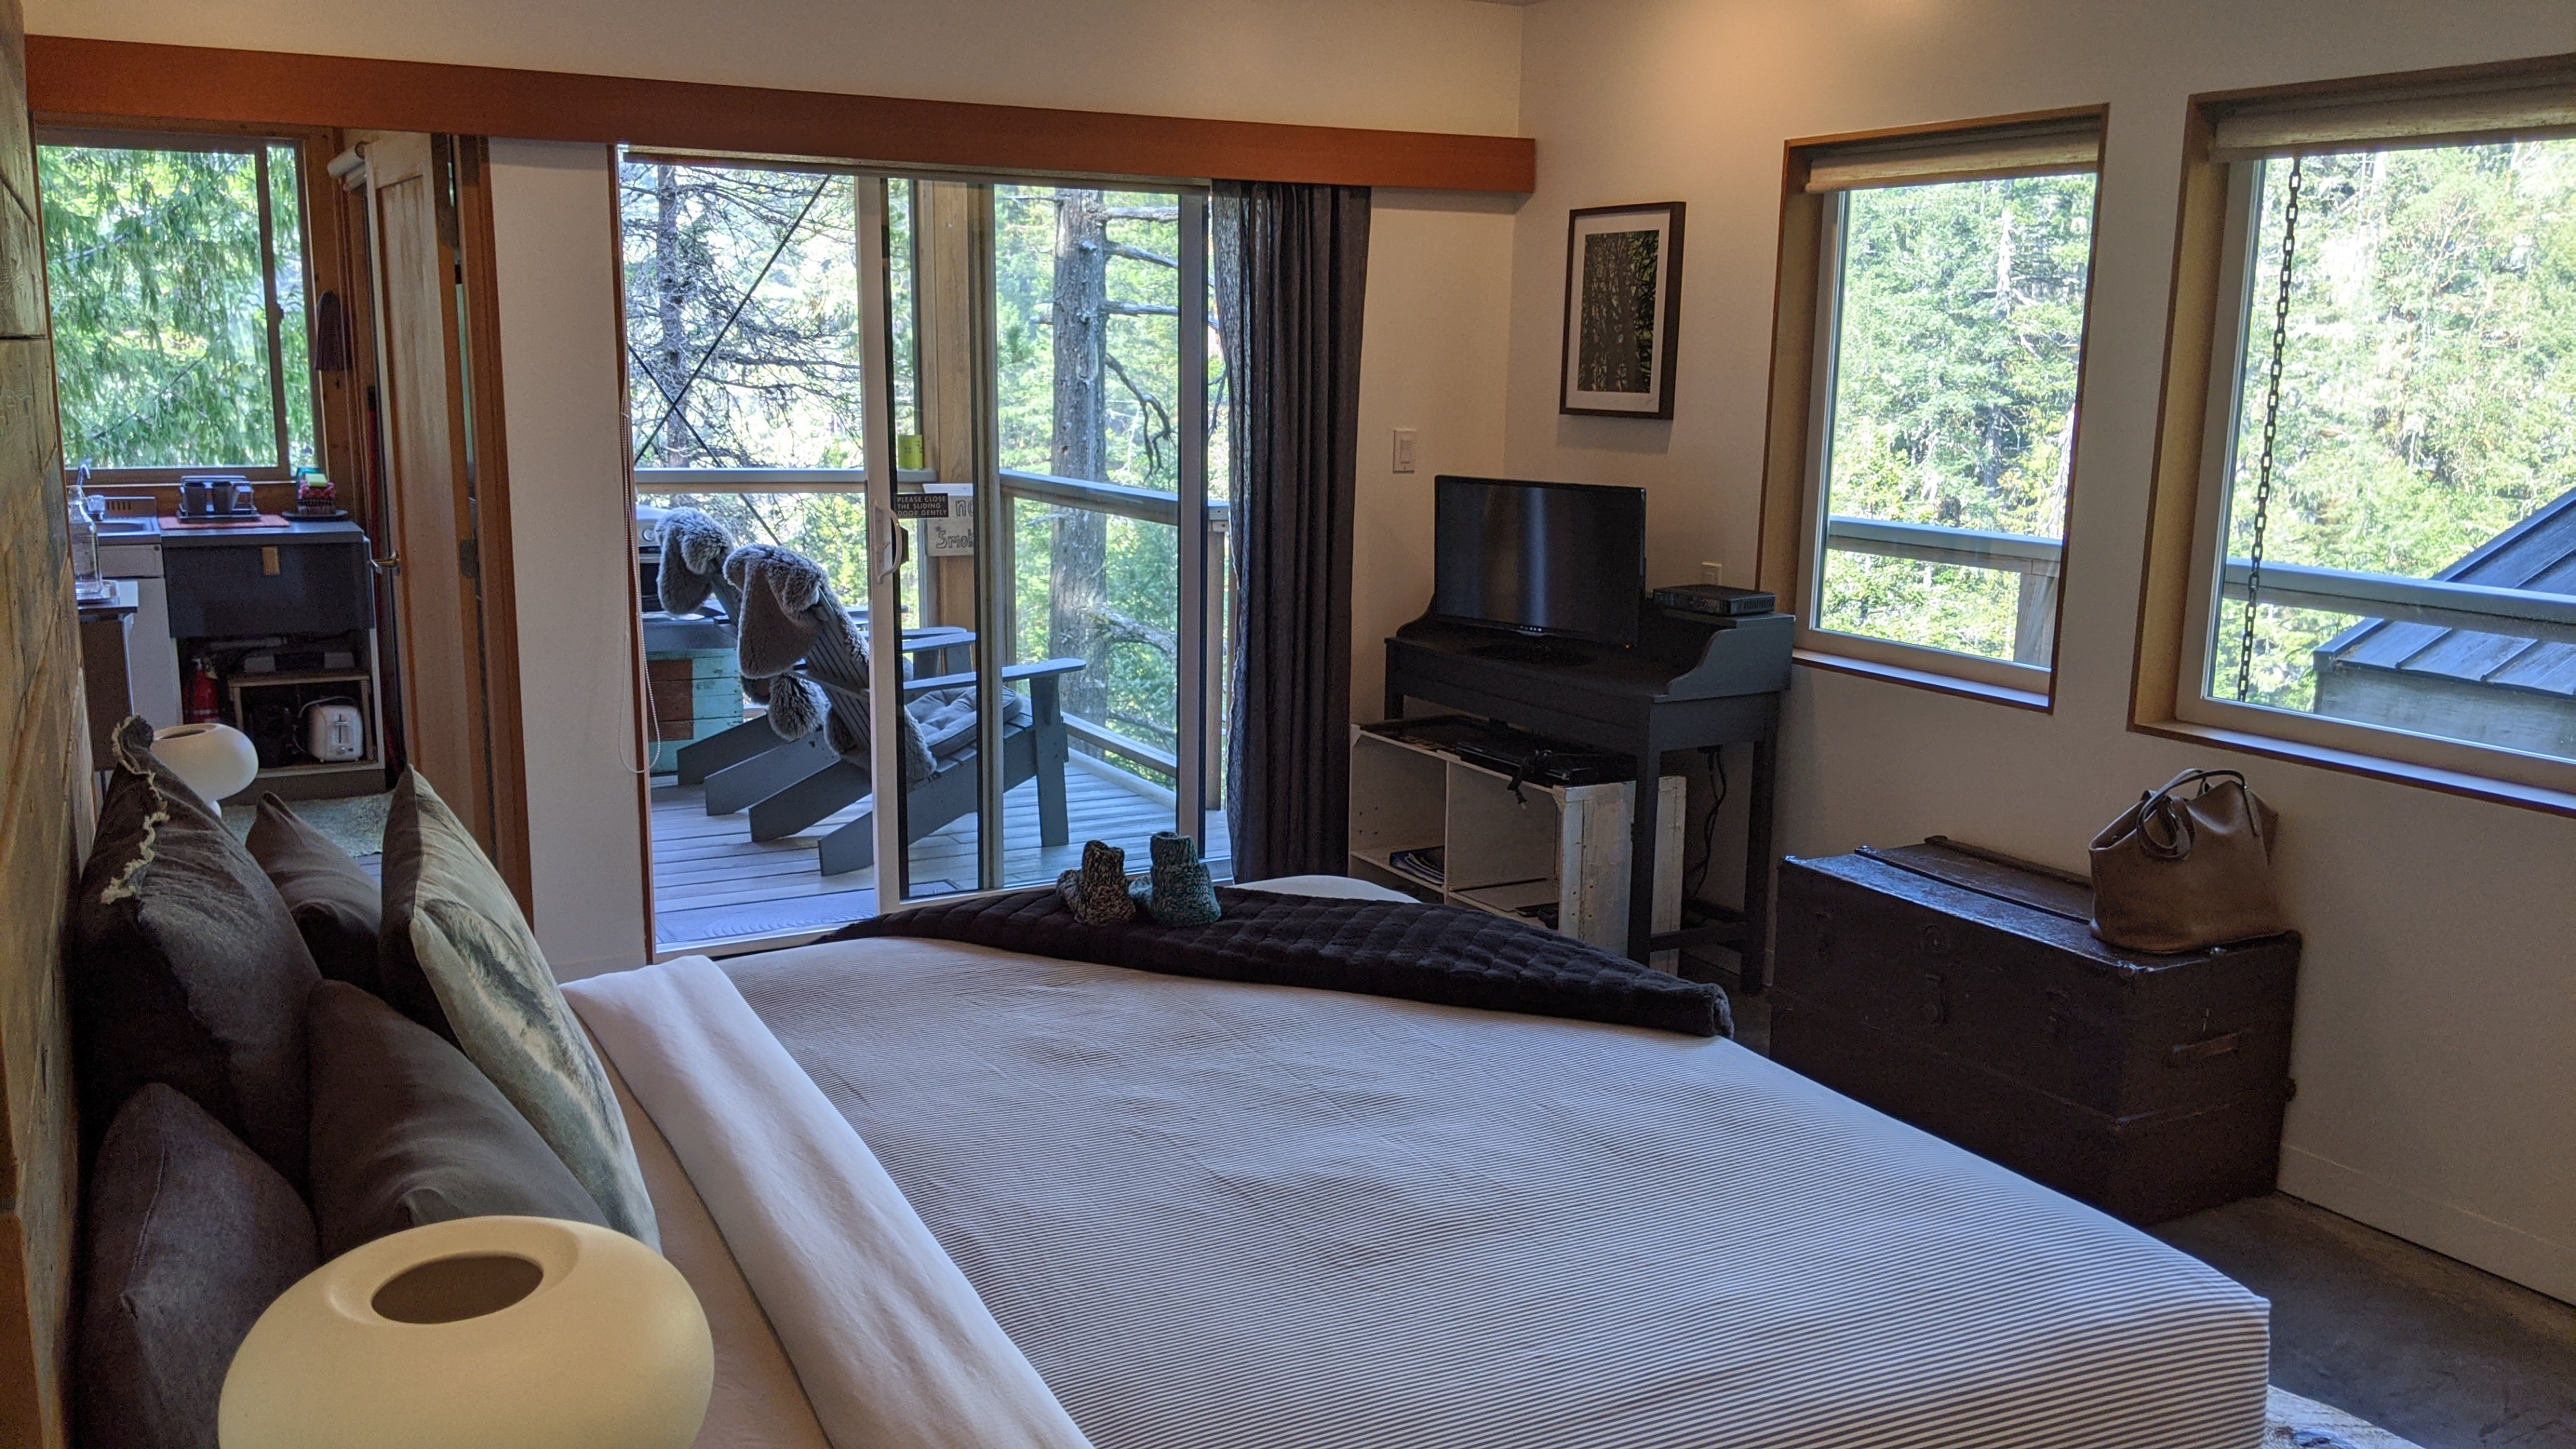 Secret Cove Treehouse Suite: The bedroom/living